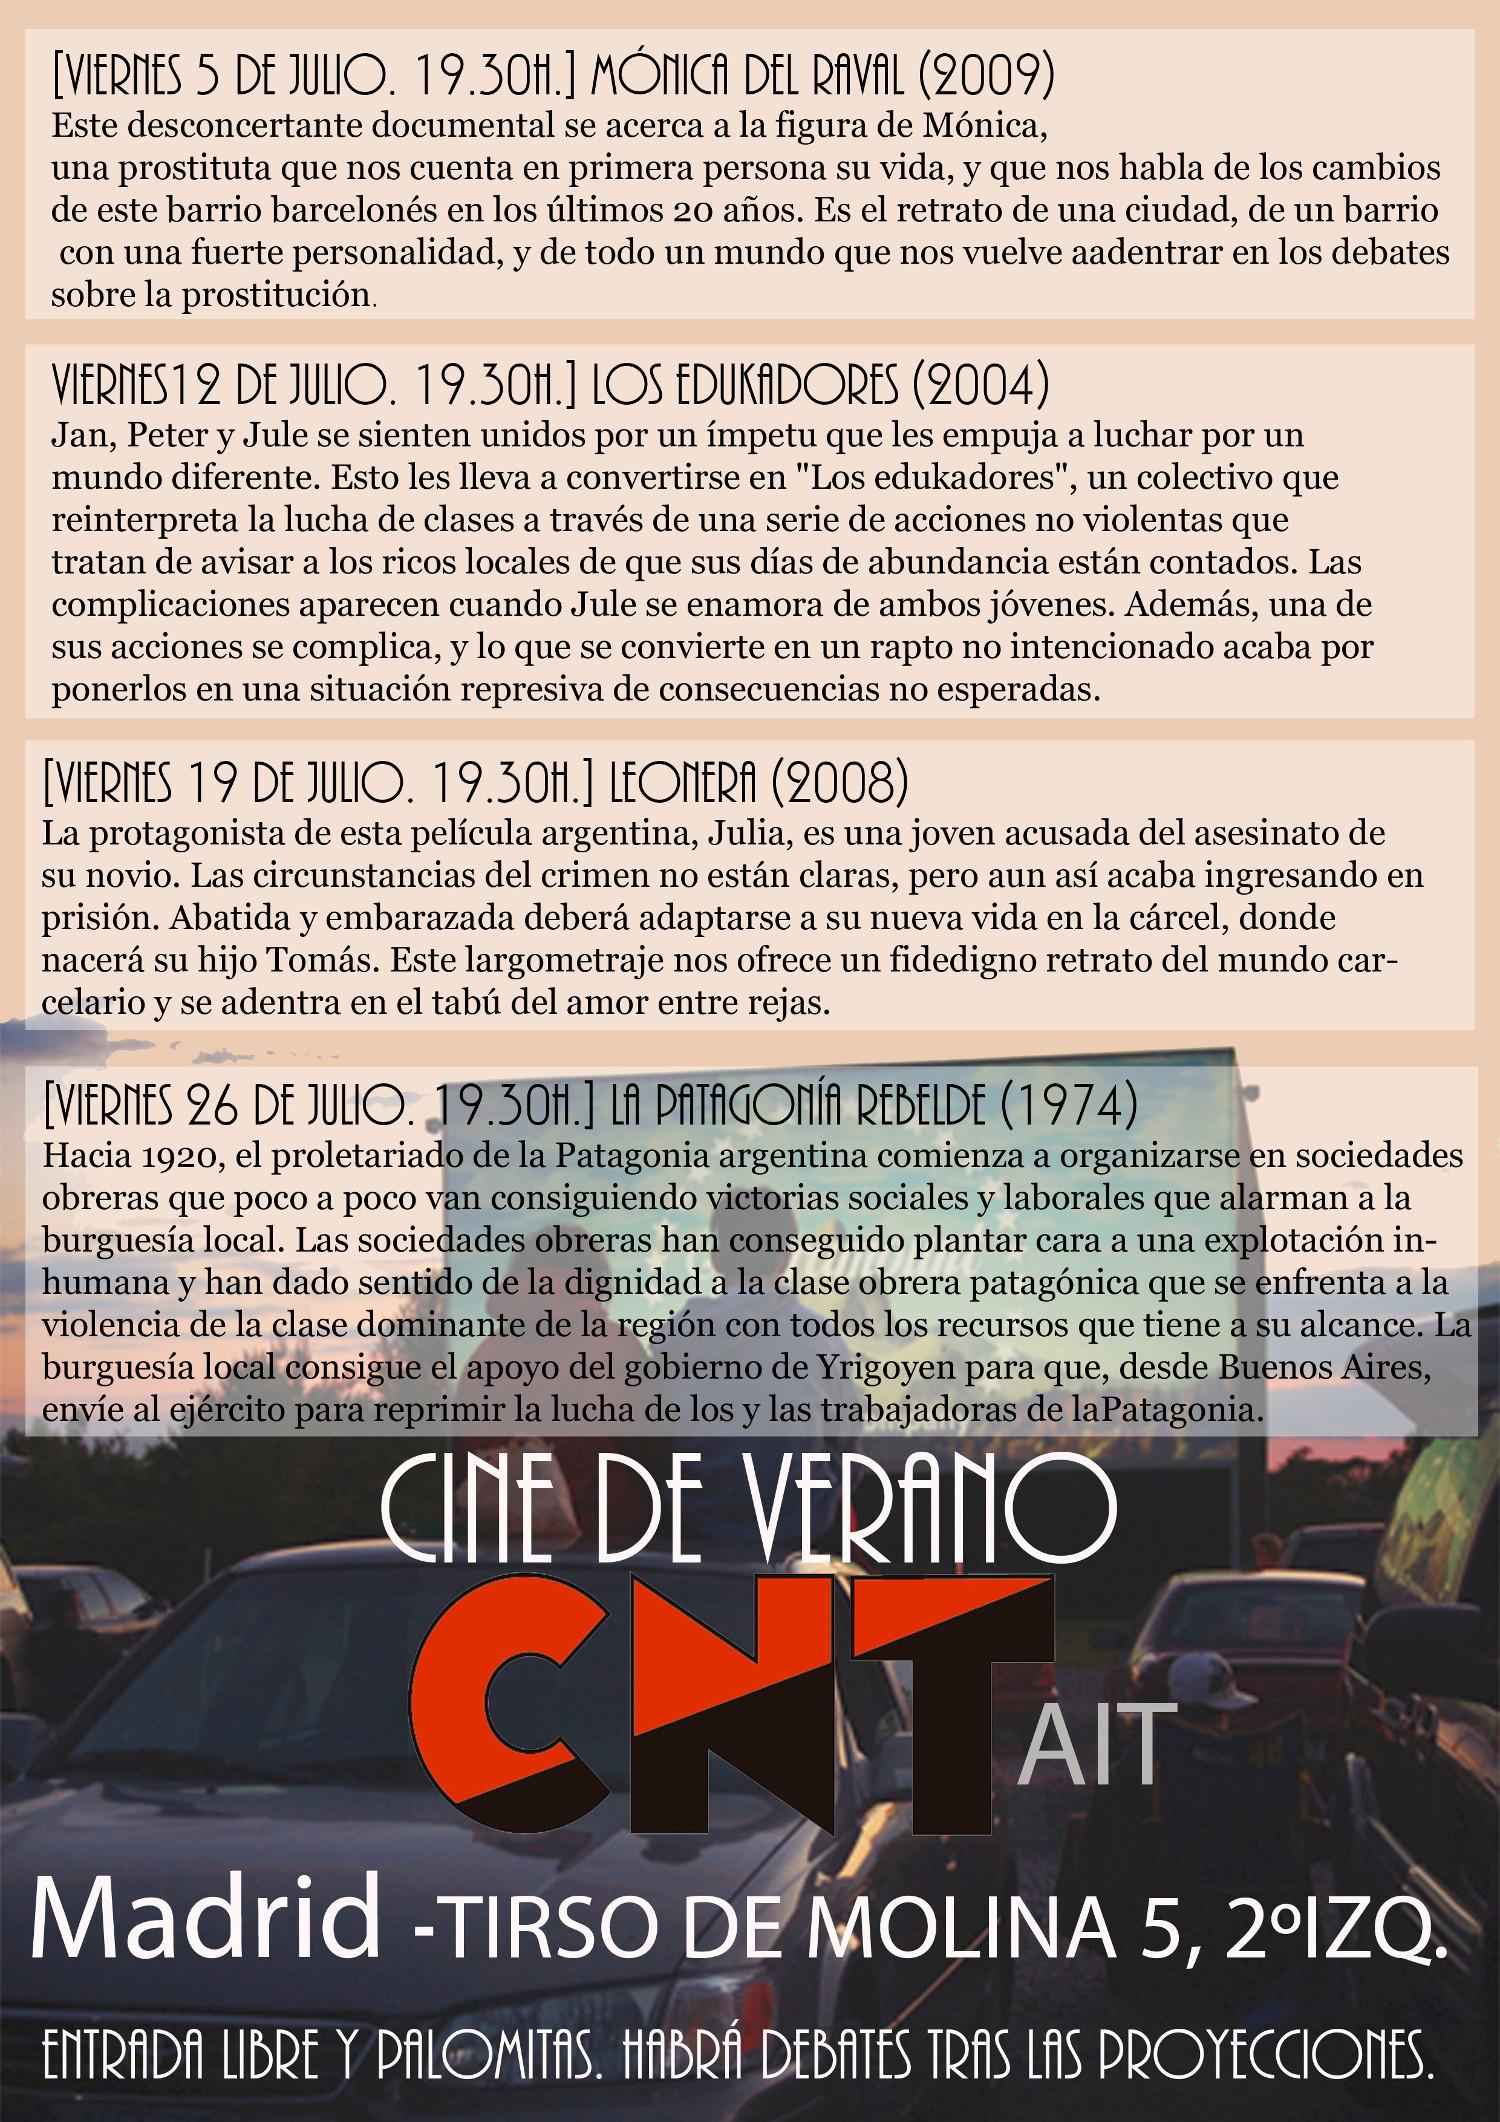 Cine de verano CNT-AIT